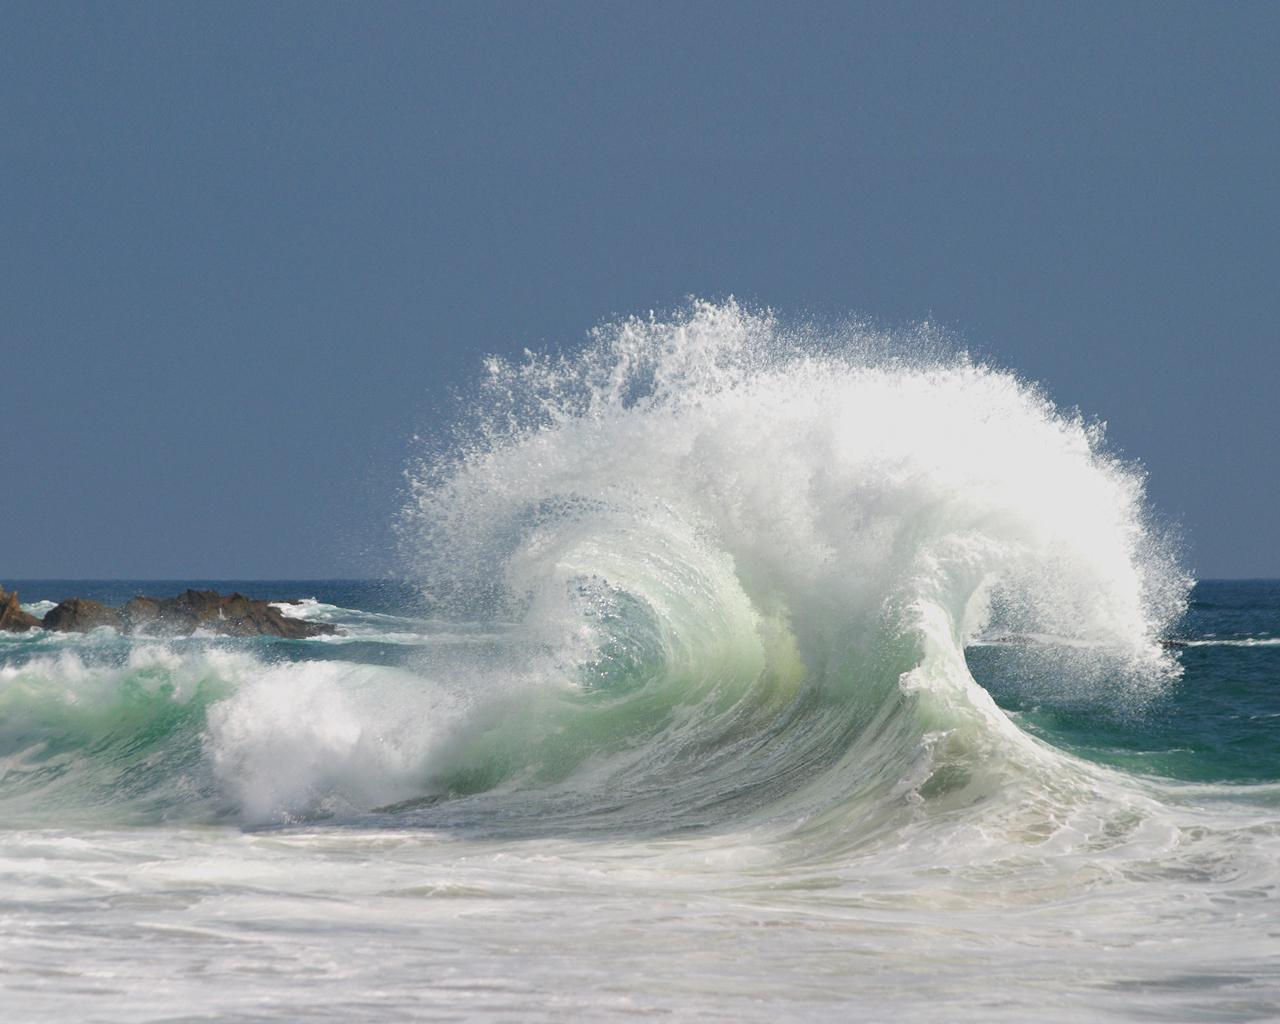 beach waves wallpaper ocean waves beach design ideas   ocean waves 1280x1024